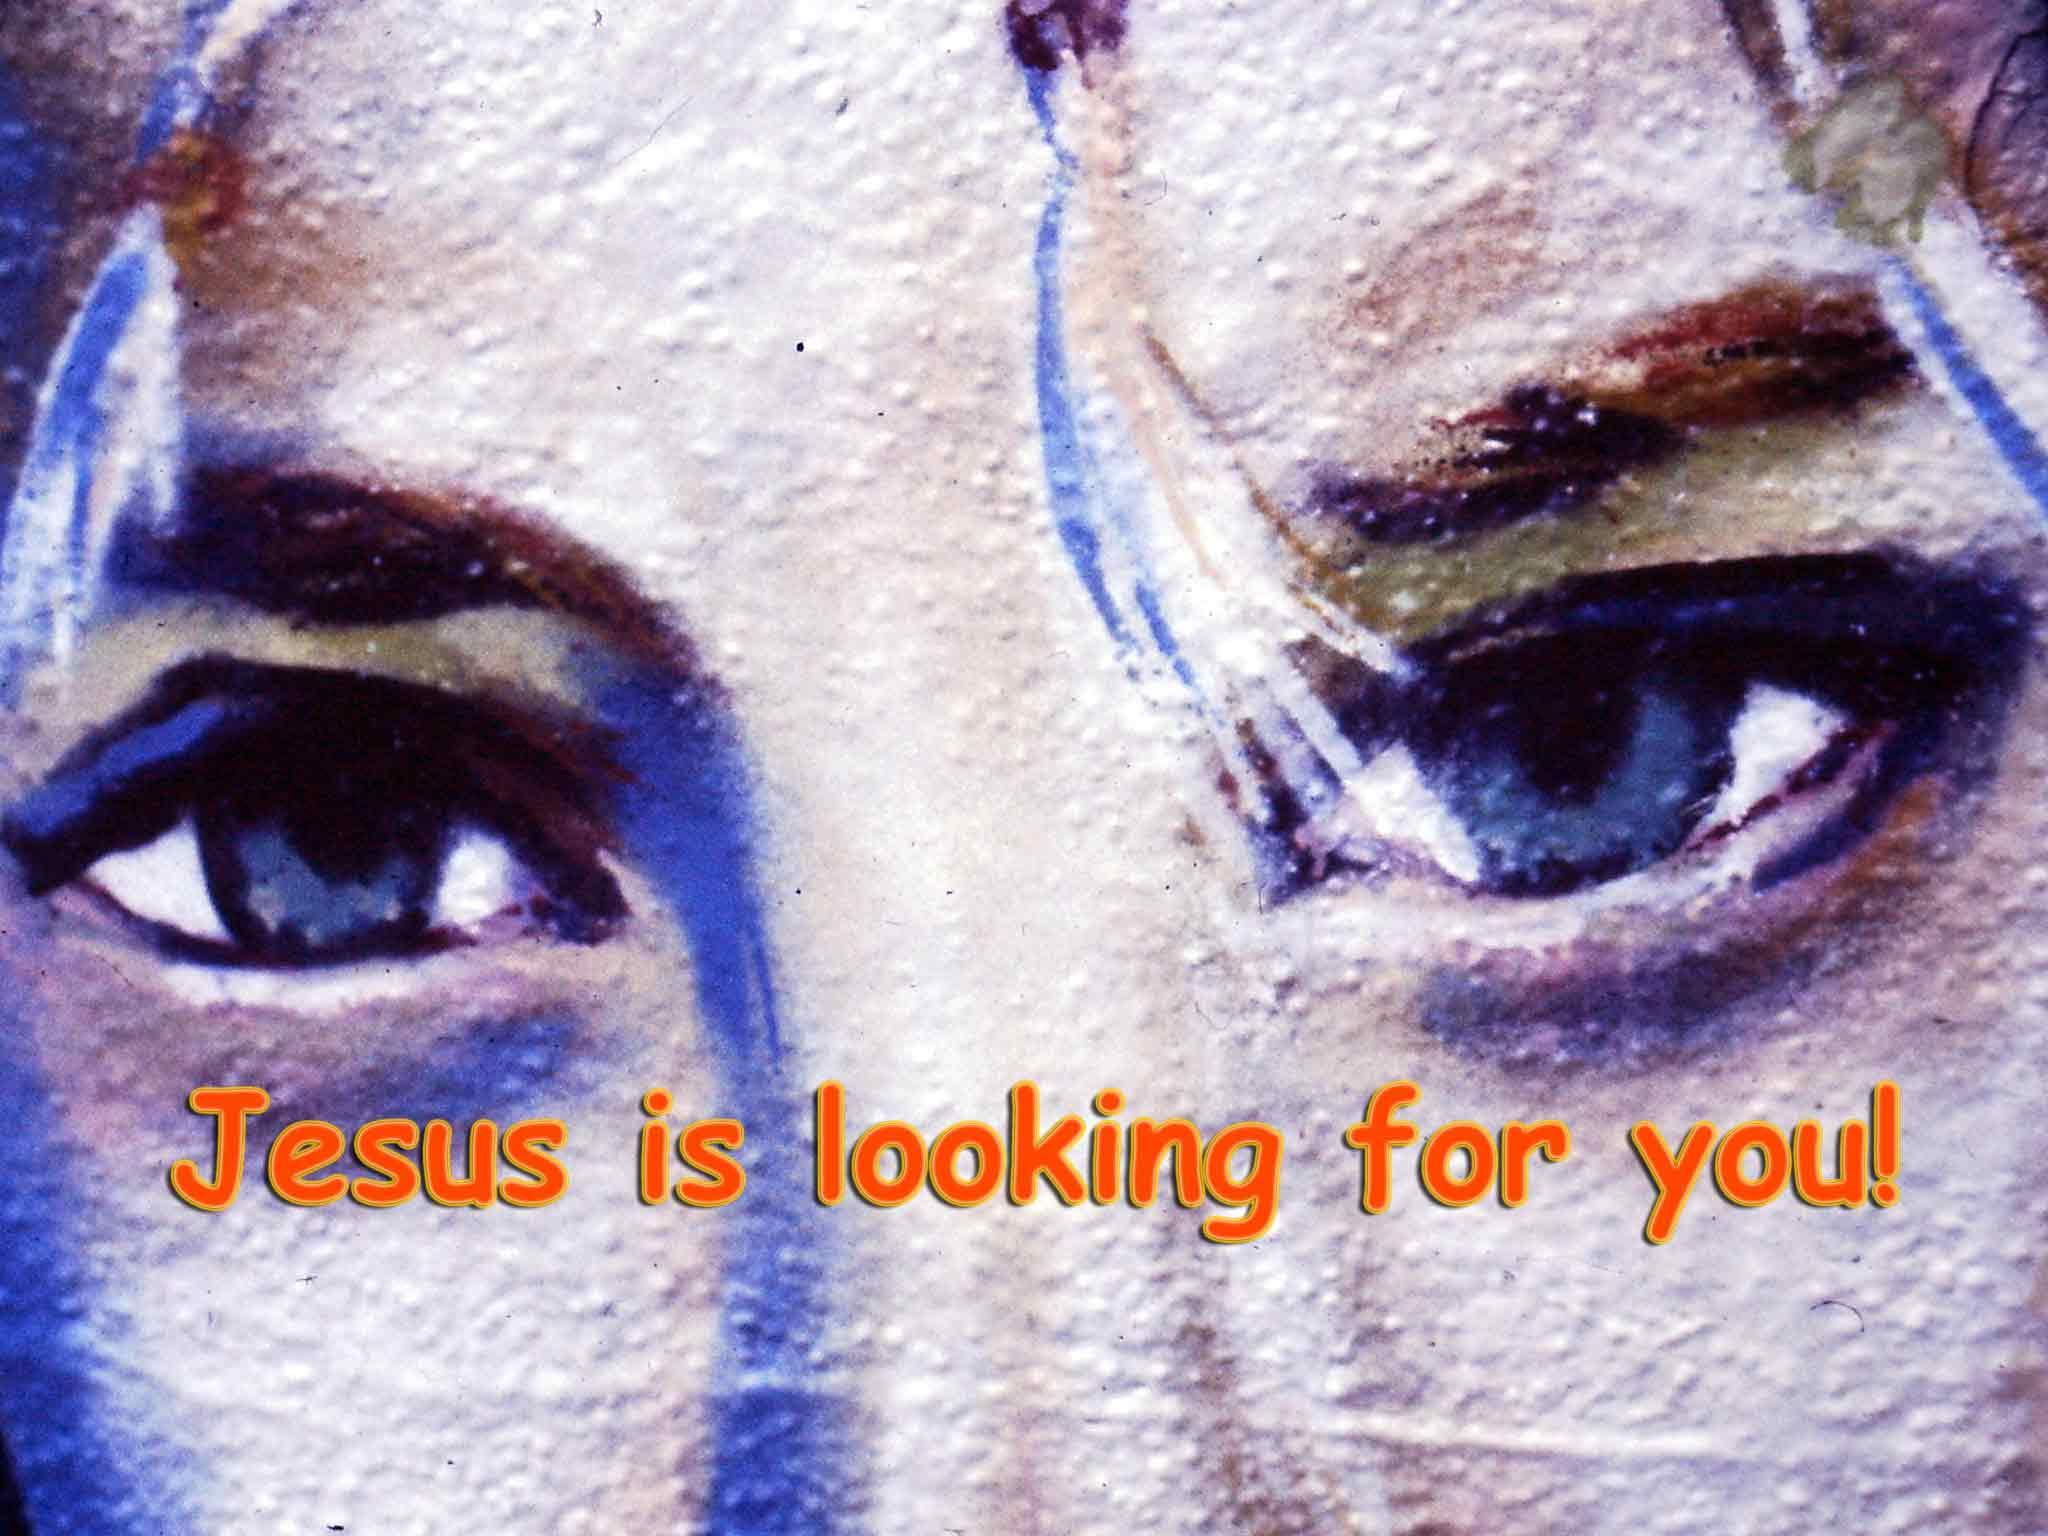 Jesus is looking for you - Foto: Christine Danzer - go 4 jesus